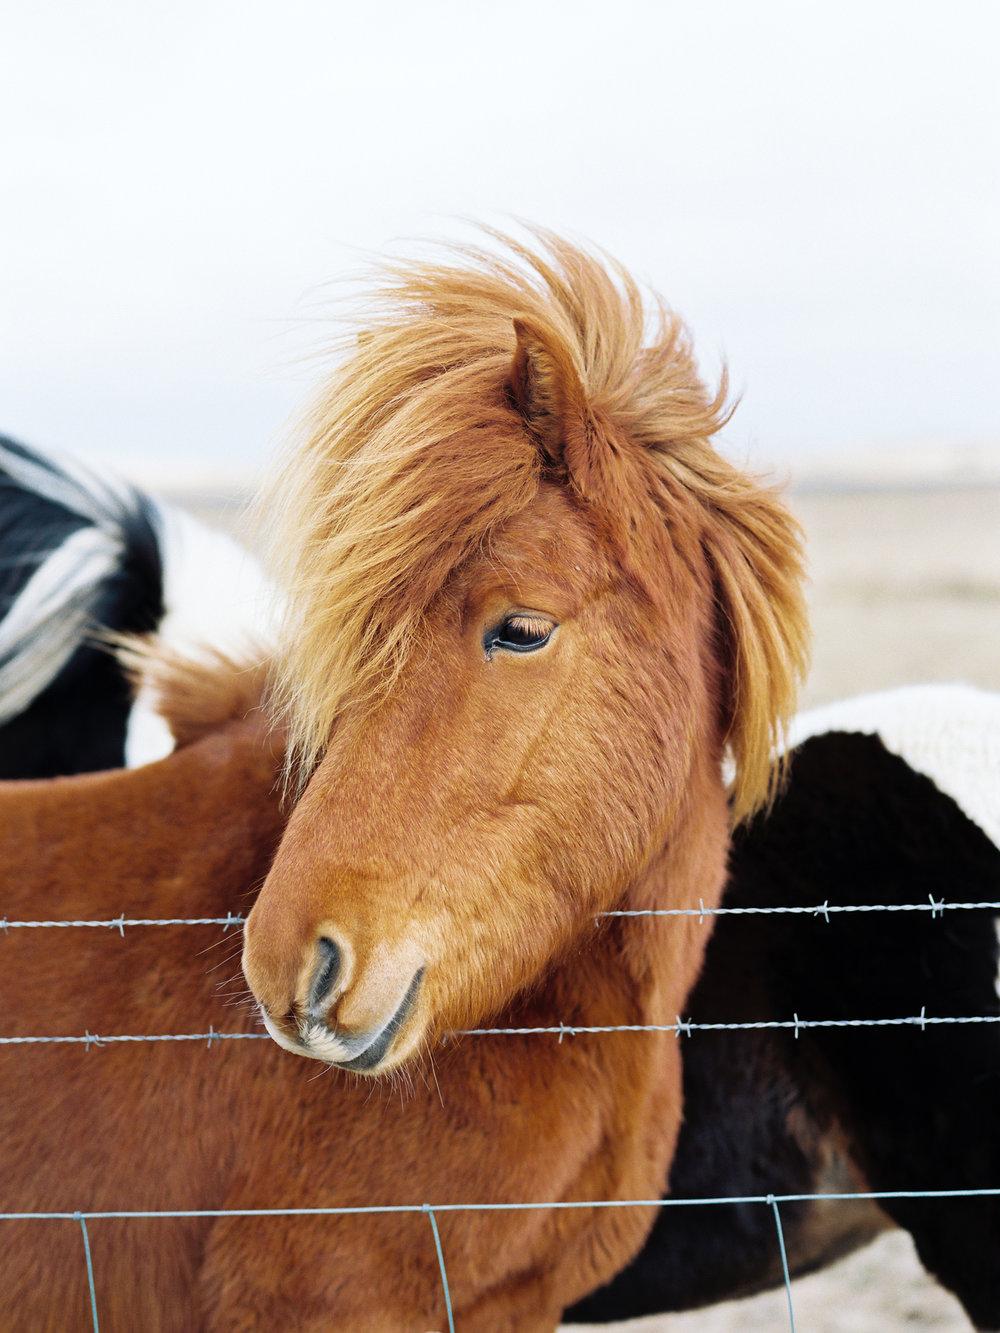 iceland icelandic horse windy mane chestnut color.jpg